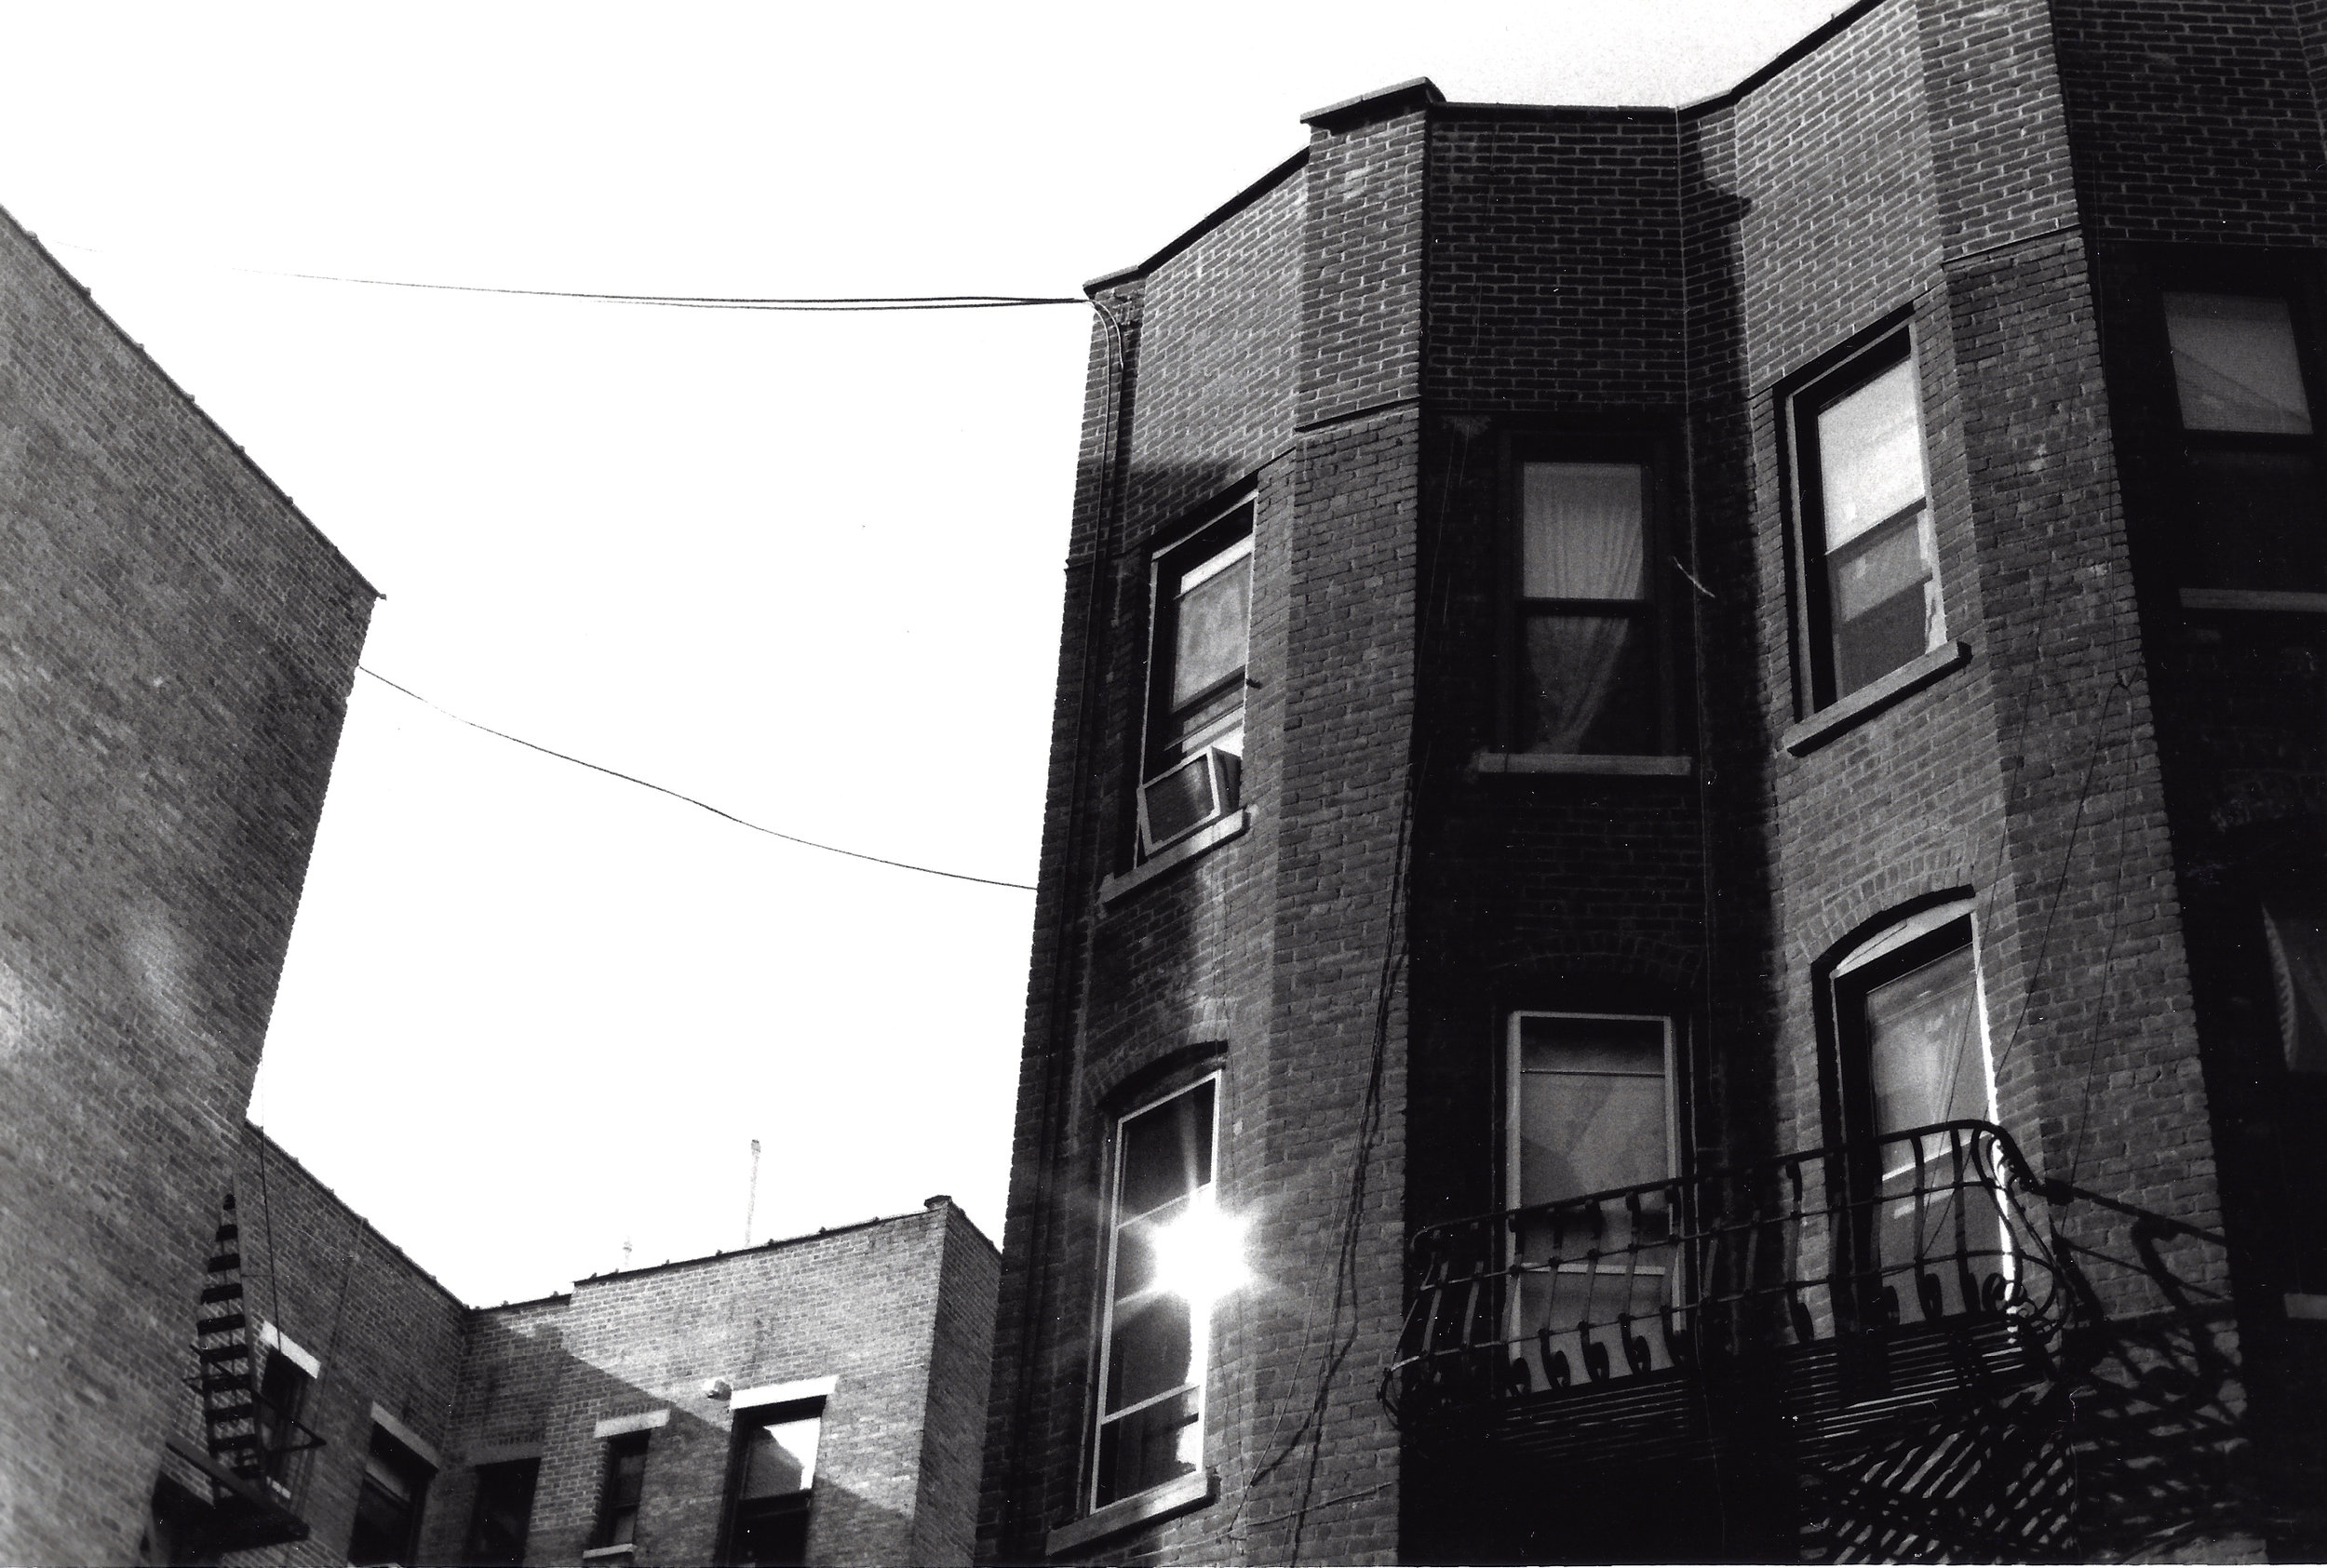 filmscans4-4-building-edit.jpg